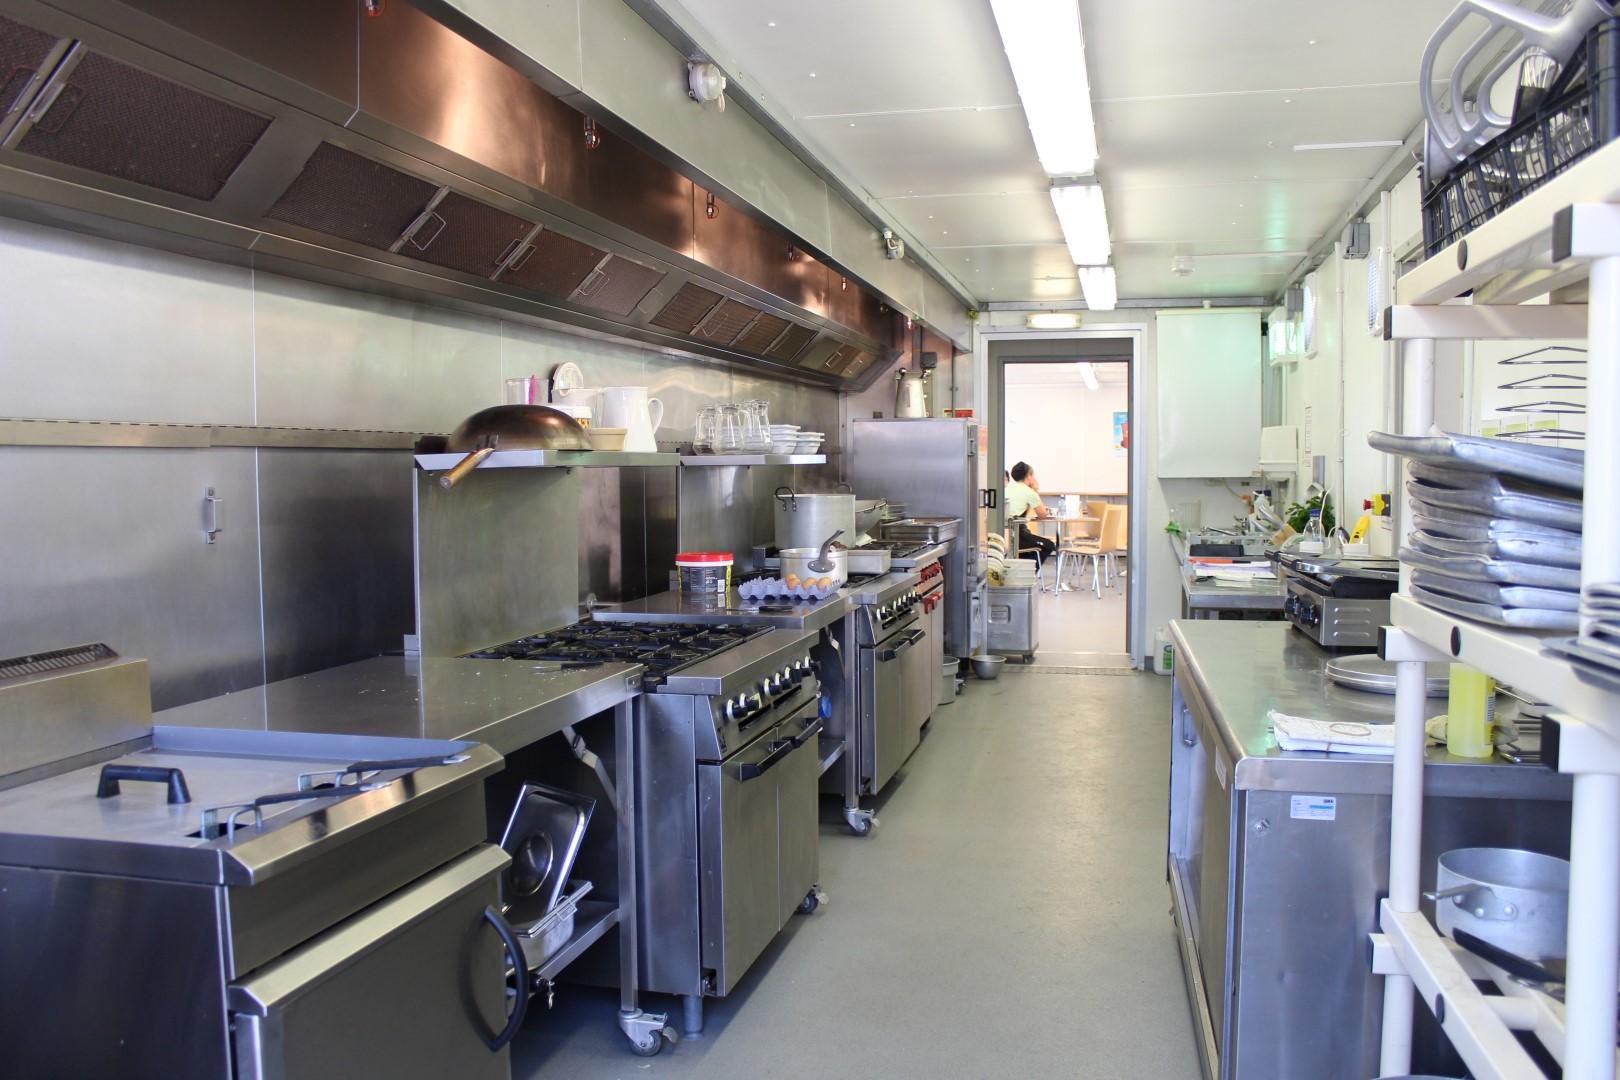 Temporary Kitchen At School During Refurbishment